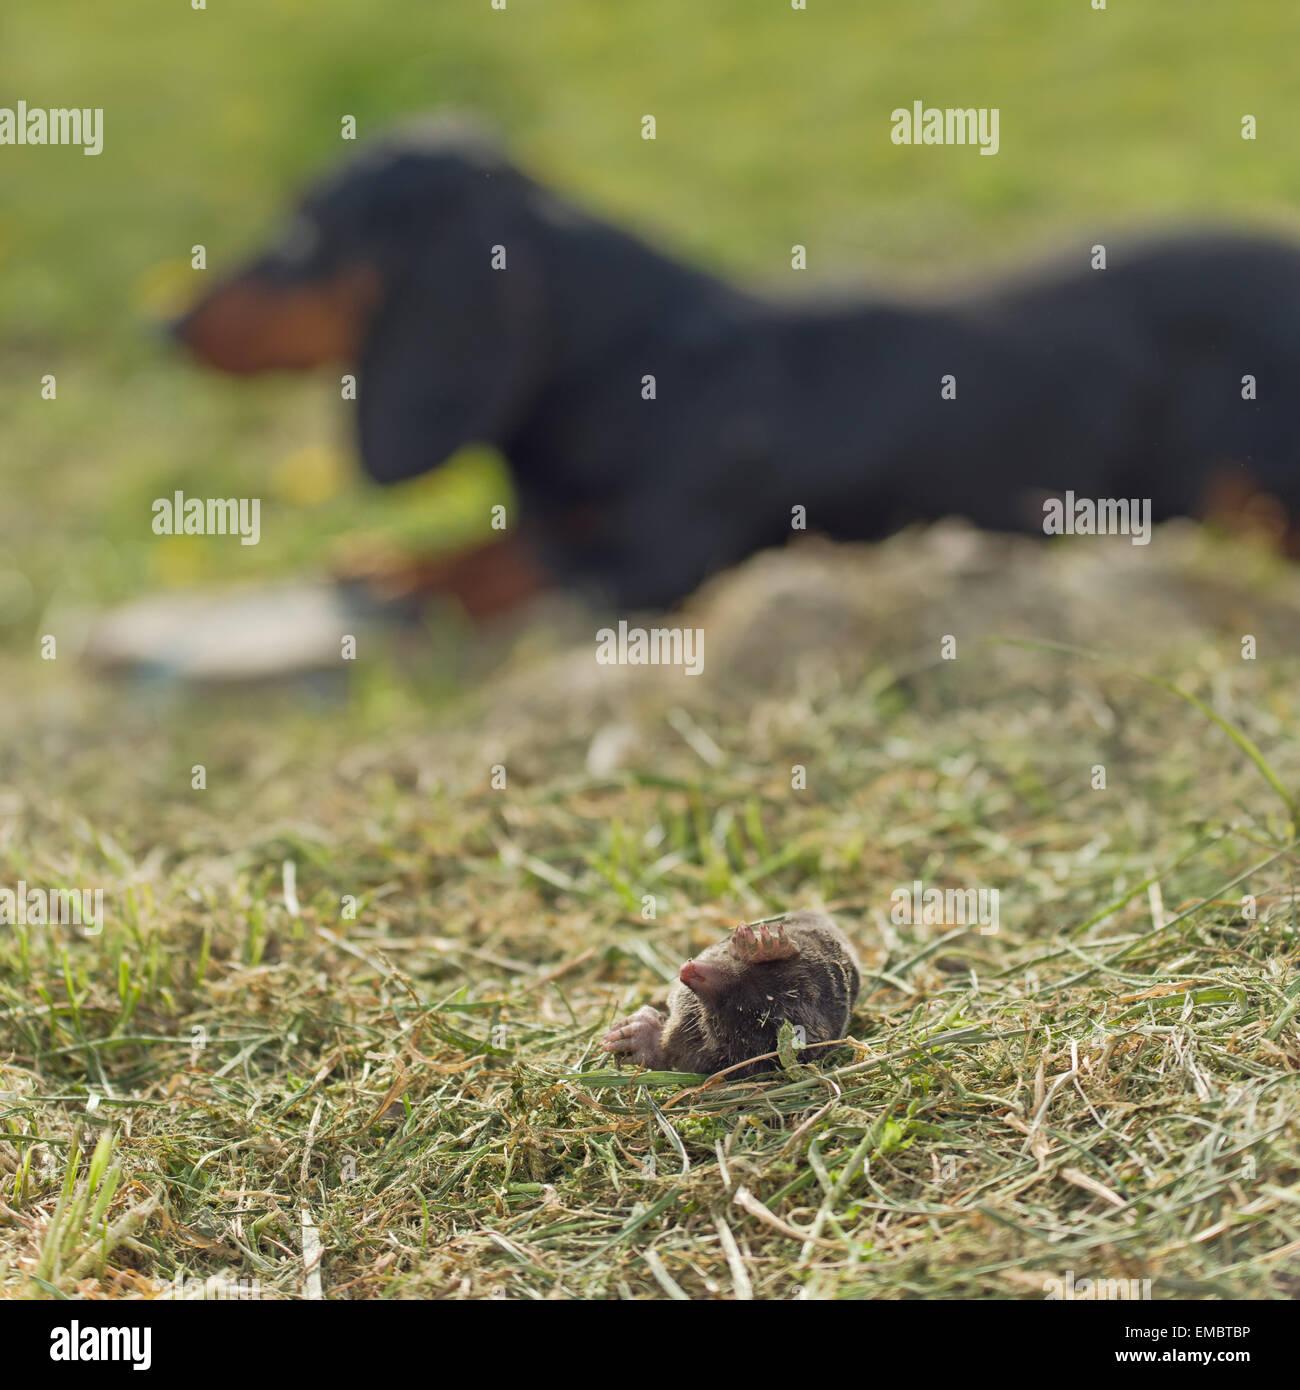 mole animal dead stockfotos mole animal dead bilder alamy. Black Bedroom Furniture Sets. Home Design Ideas